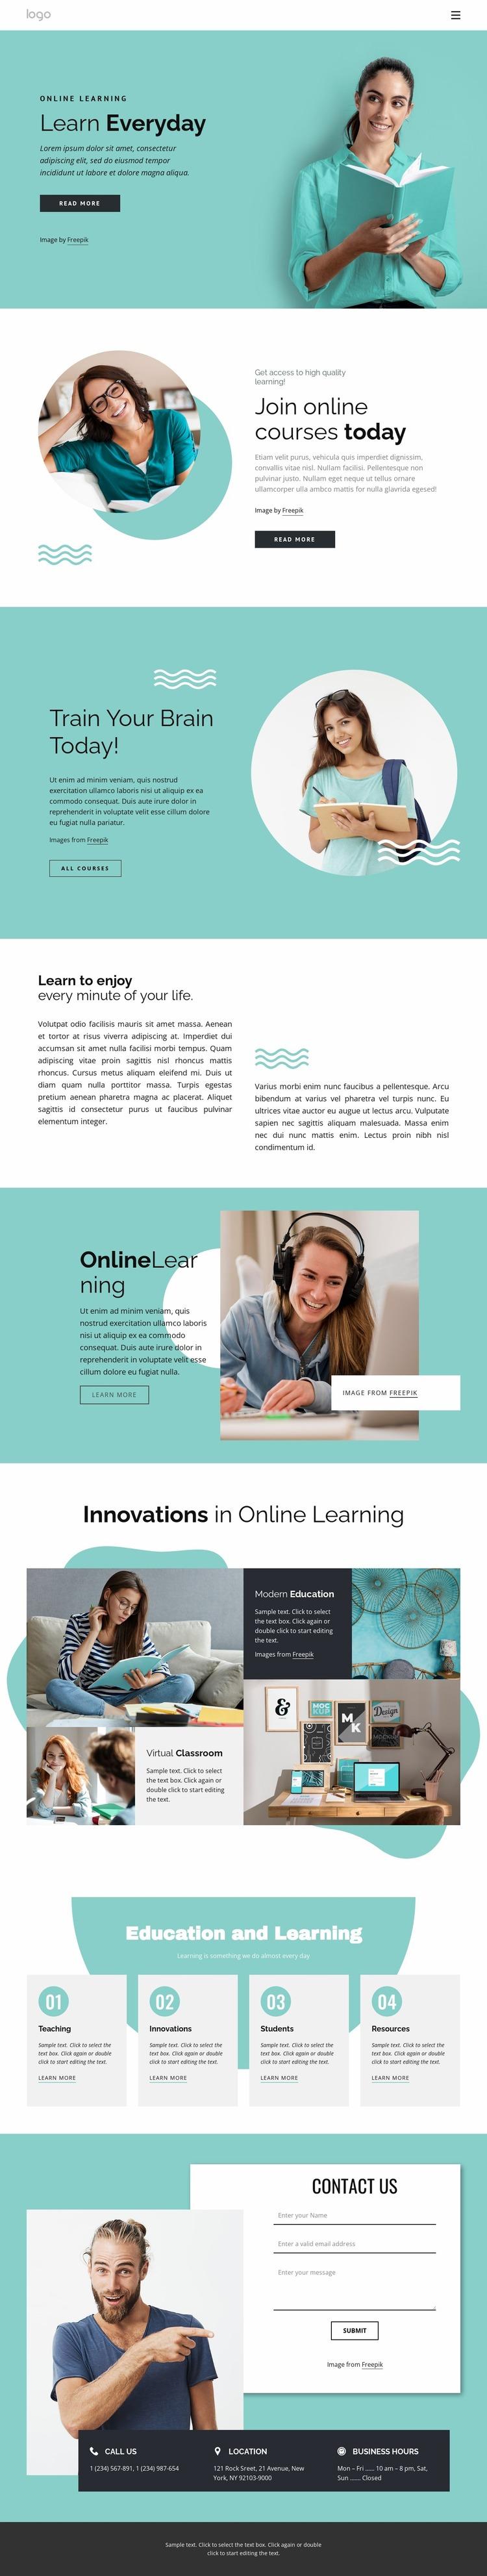 Learning is a lifelong process Website Mockup